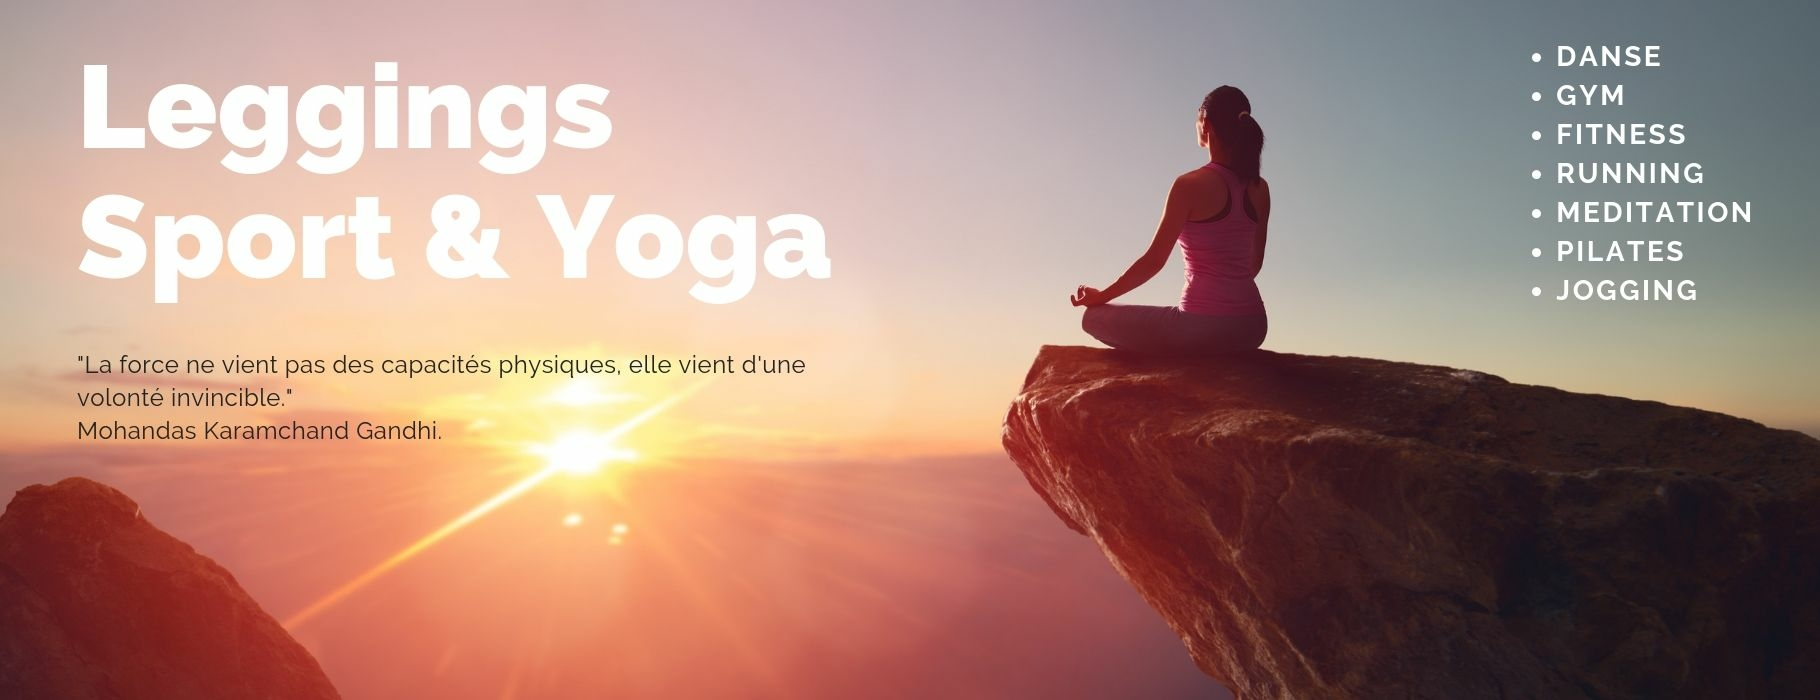 Leggings Sport & Yoga